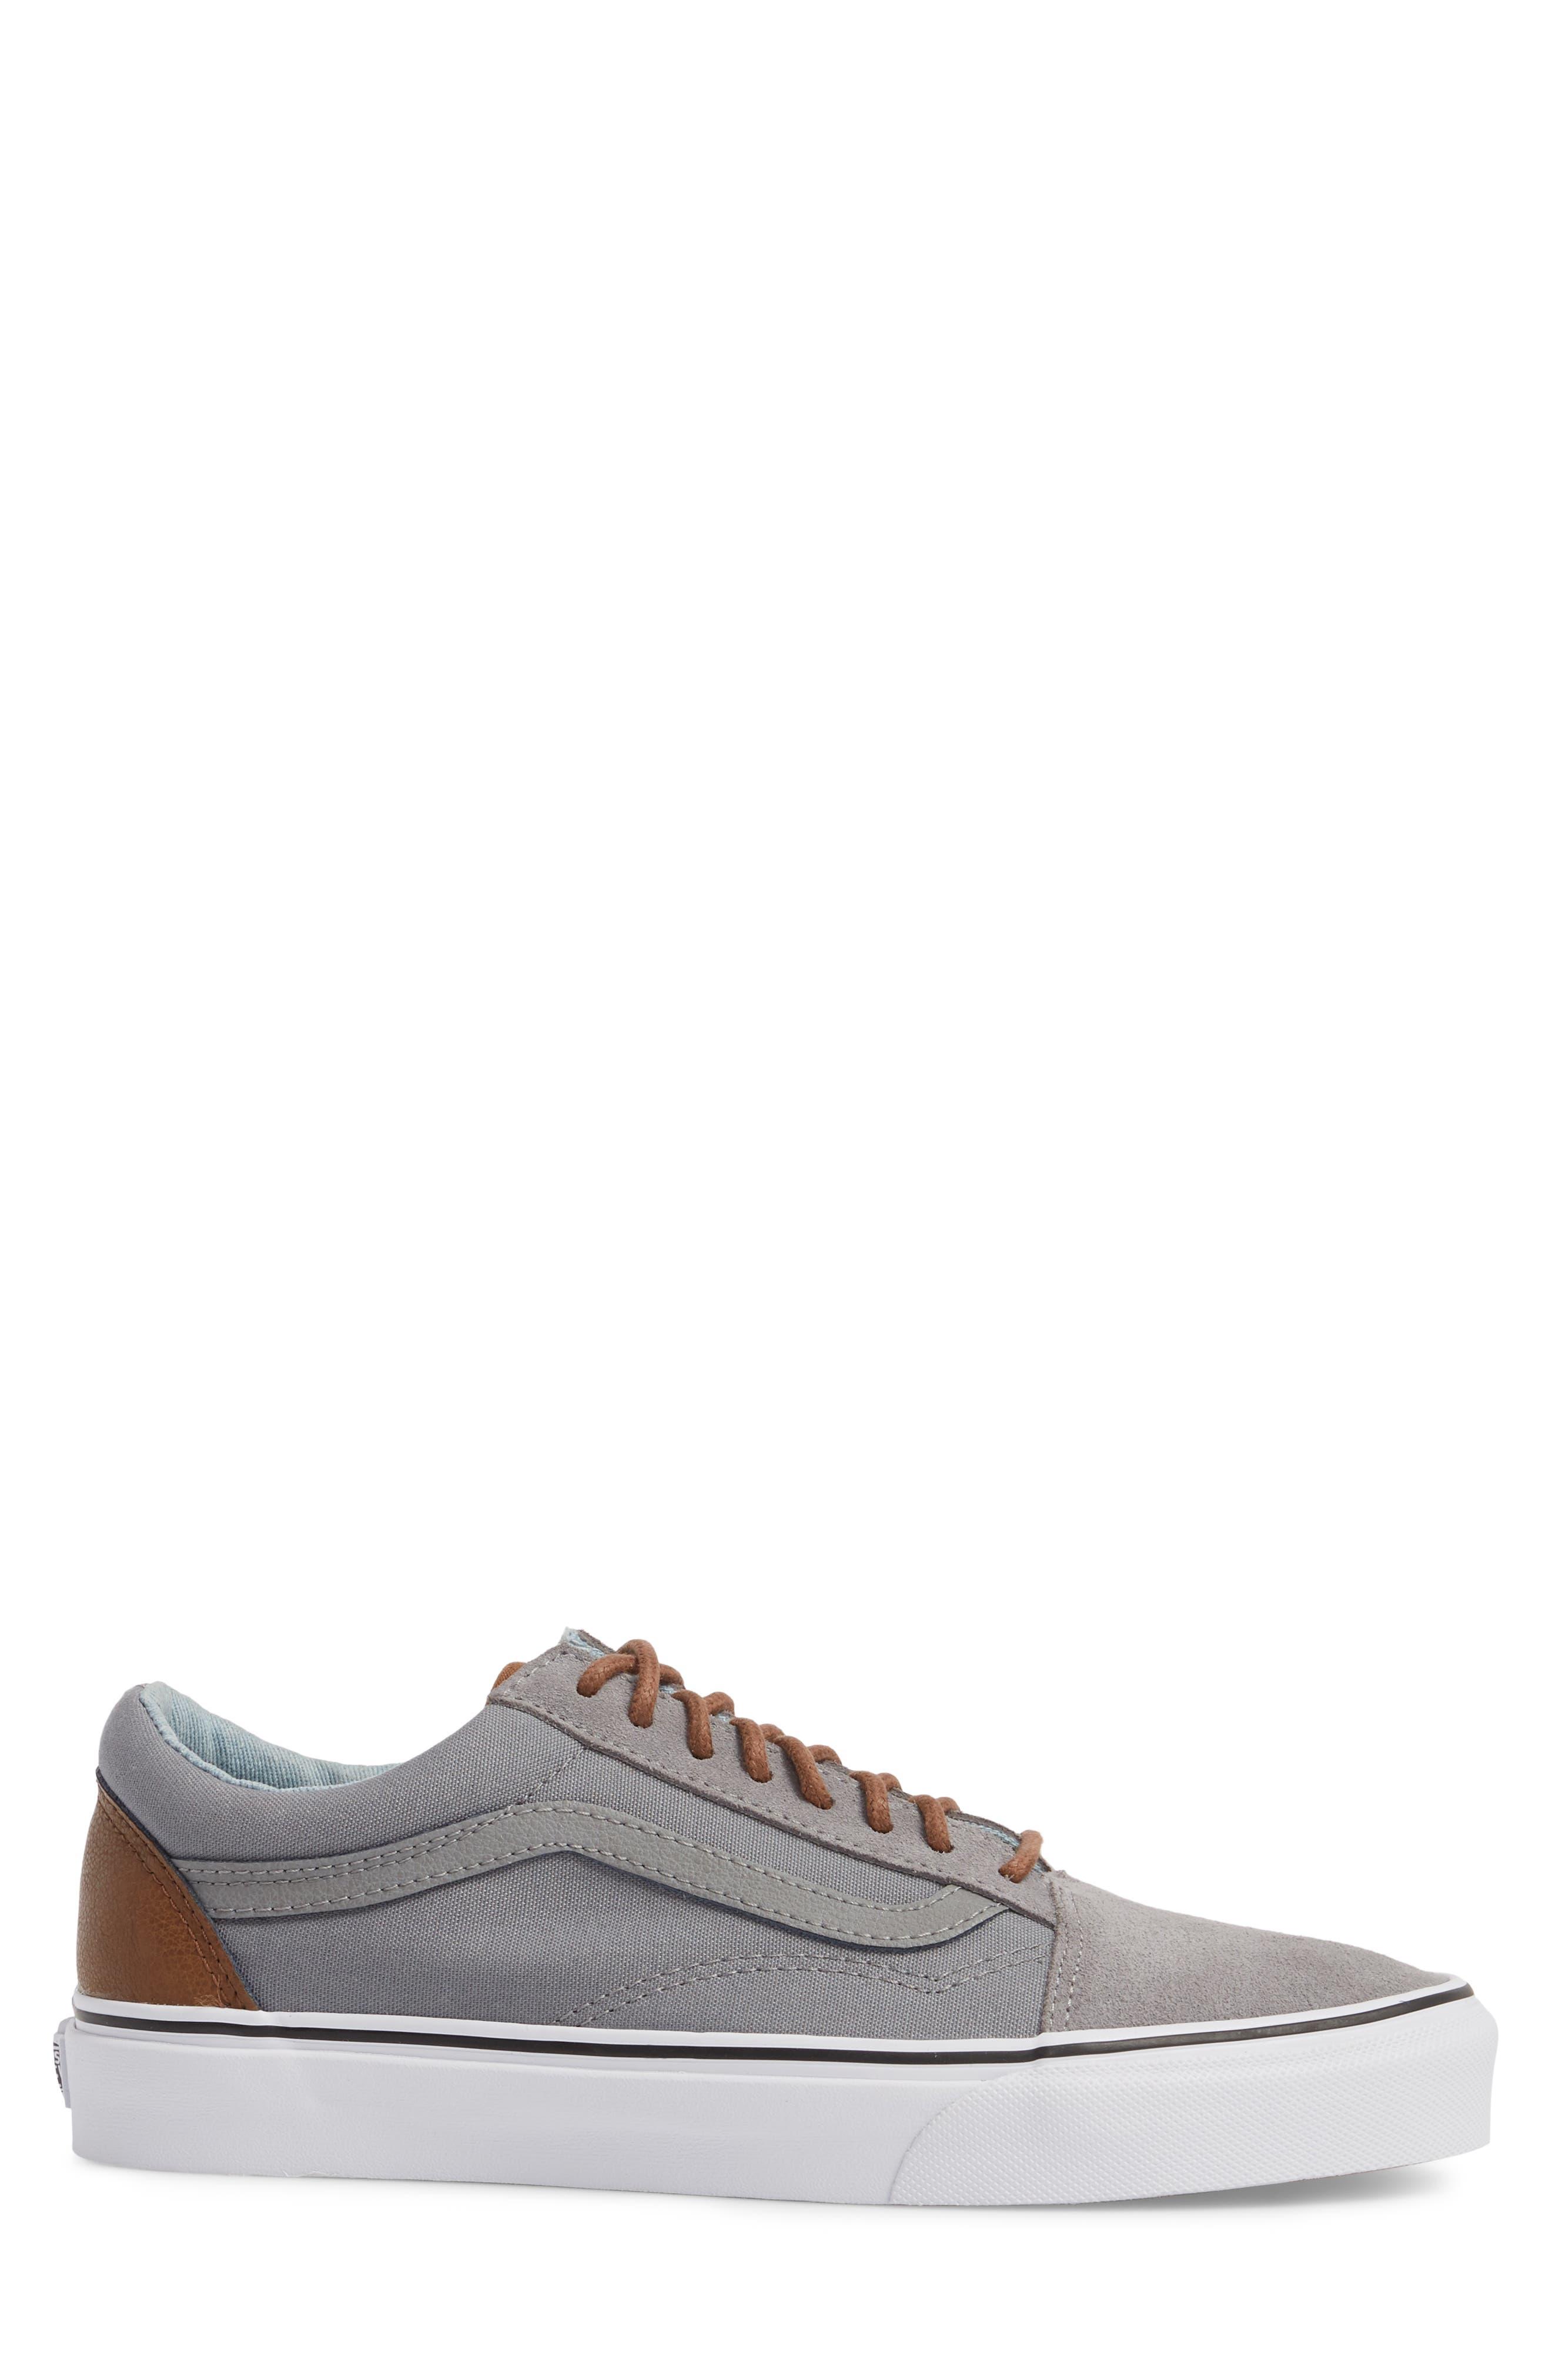 Old Skool Low Top Sneaker,                             Alternate thumbnail 3, color,                             Frost Grey/ Acid Denim Leather